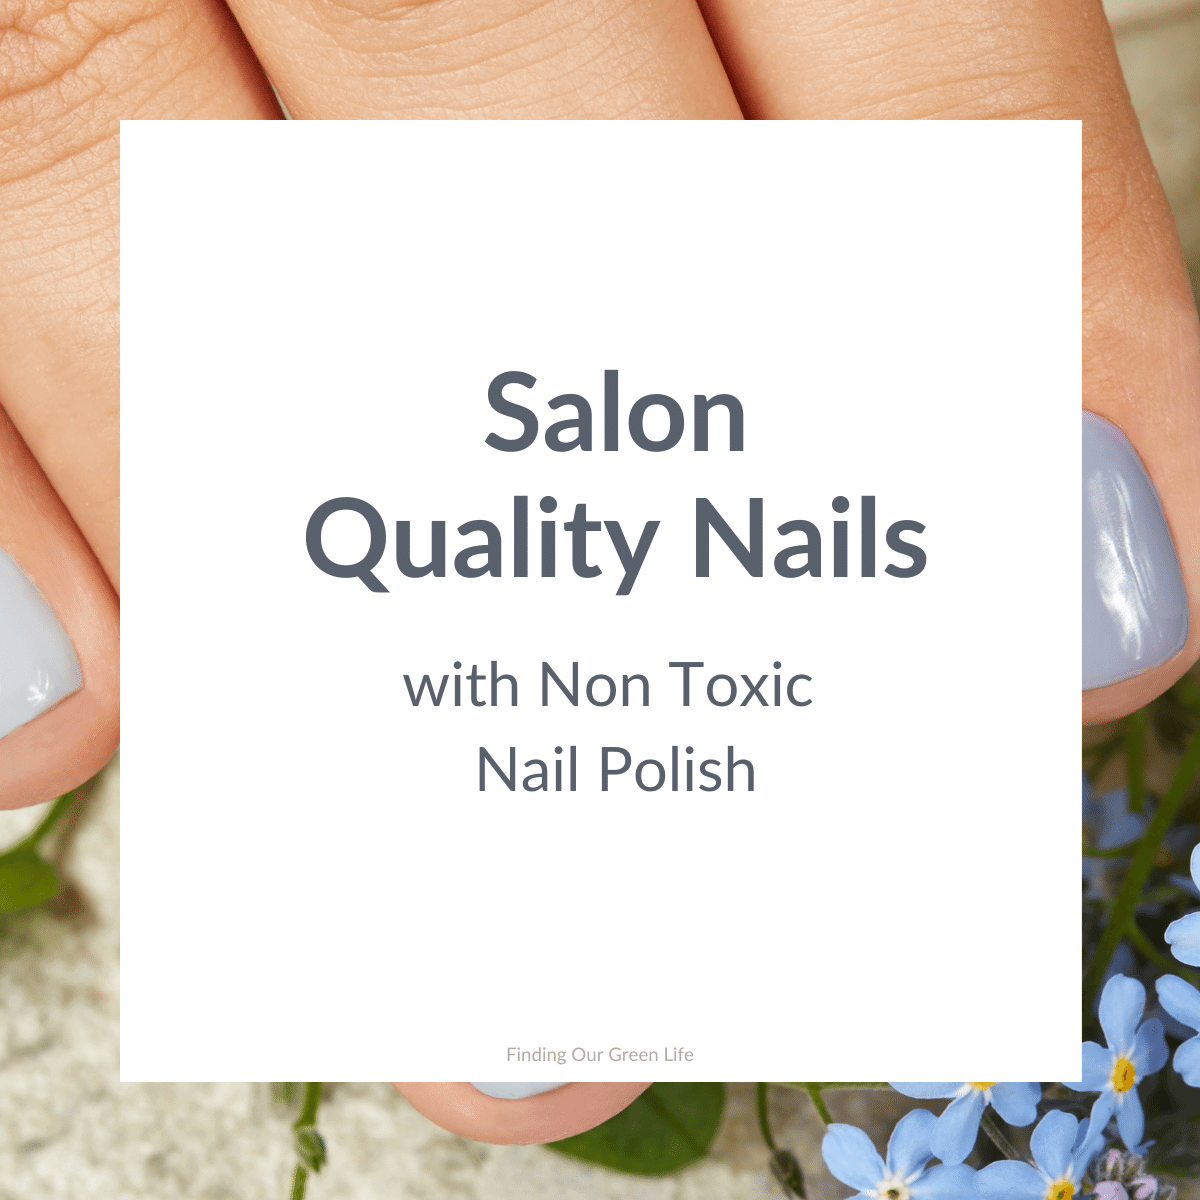 non toxic nail polish on fingers